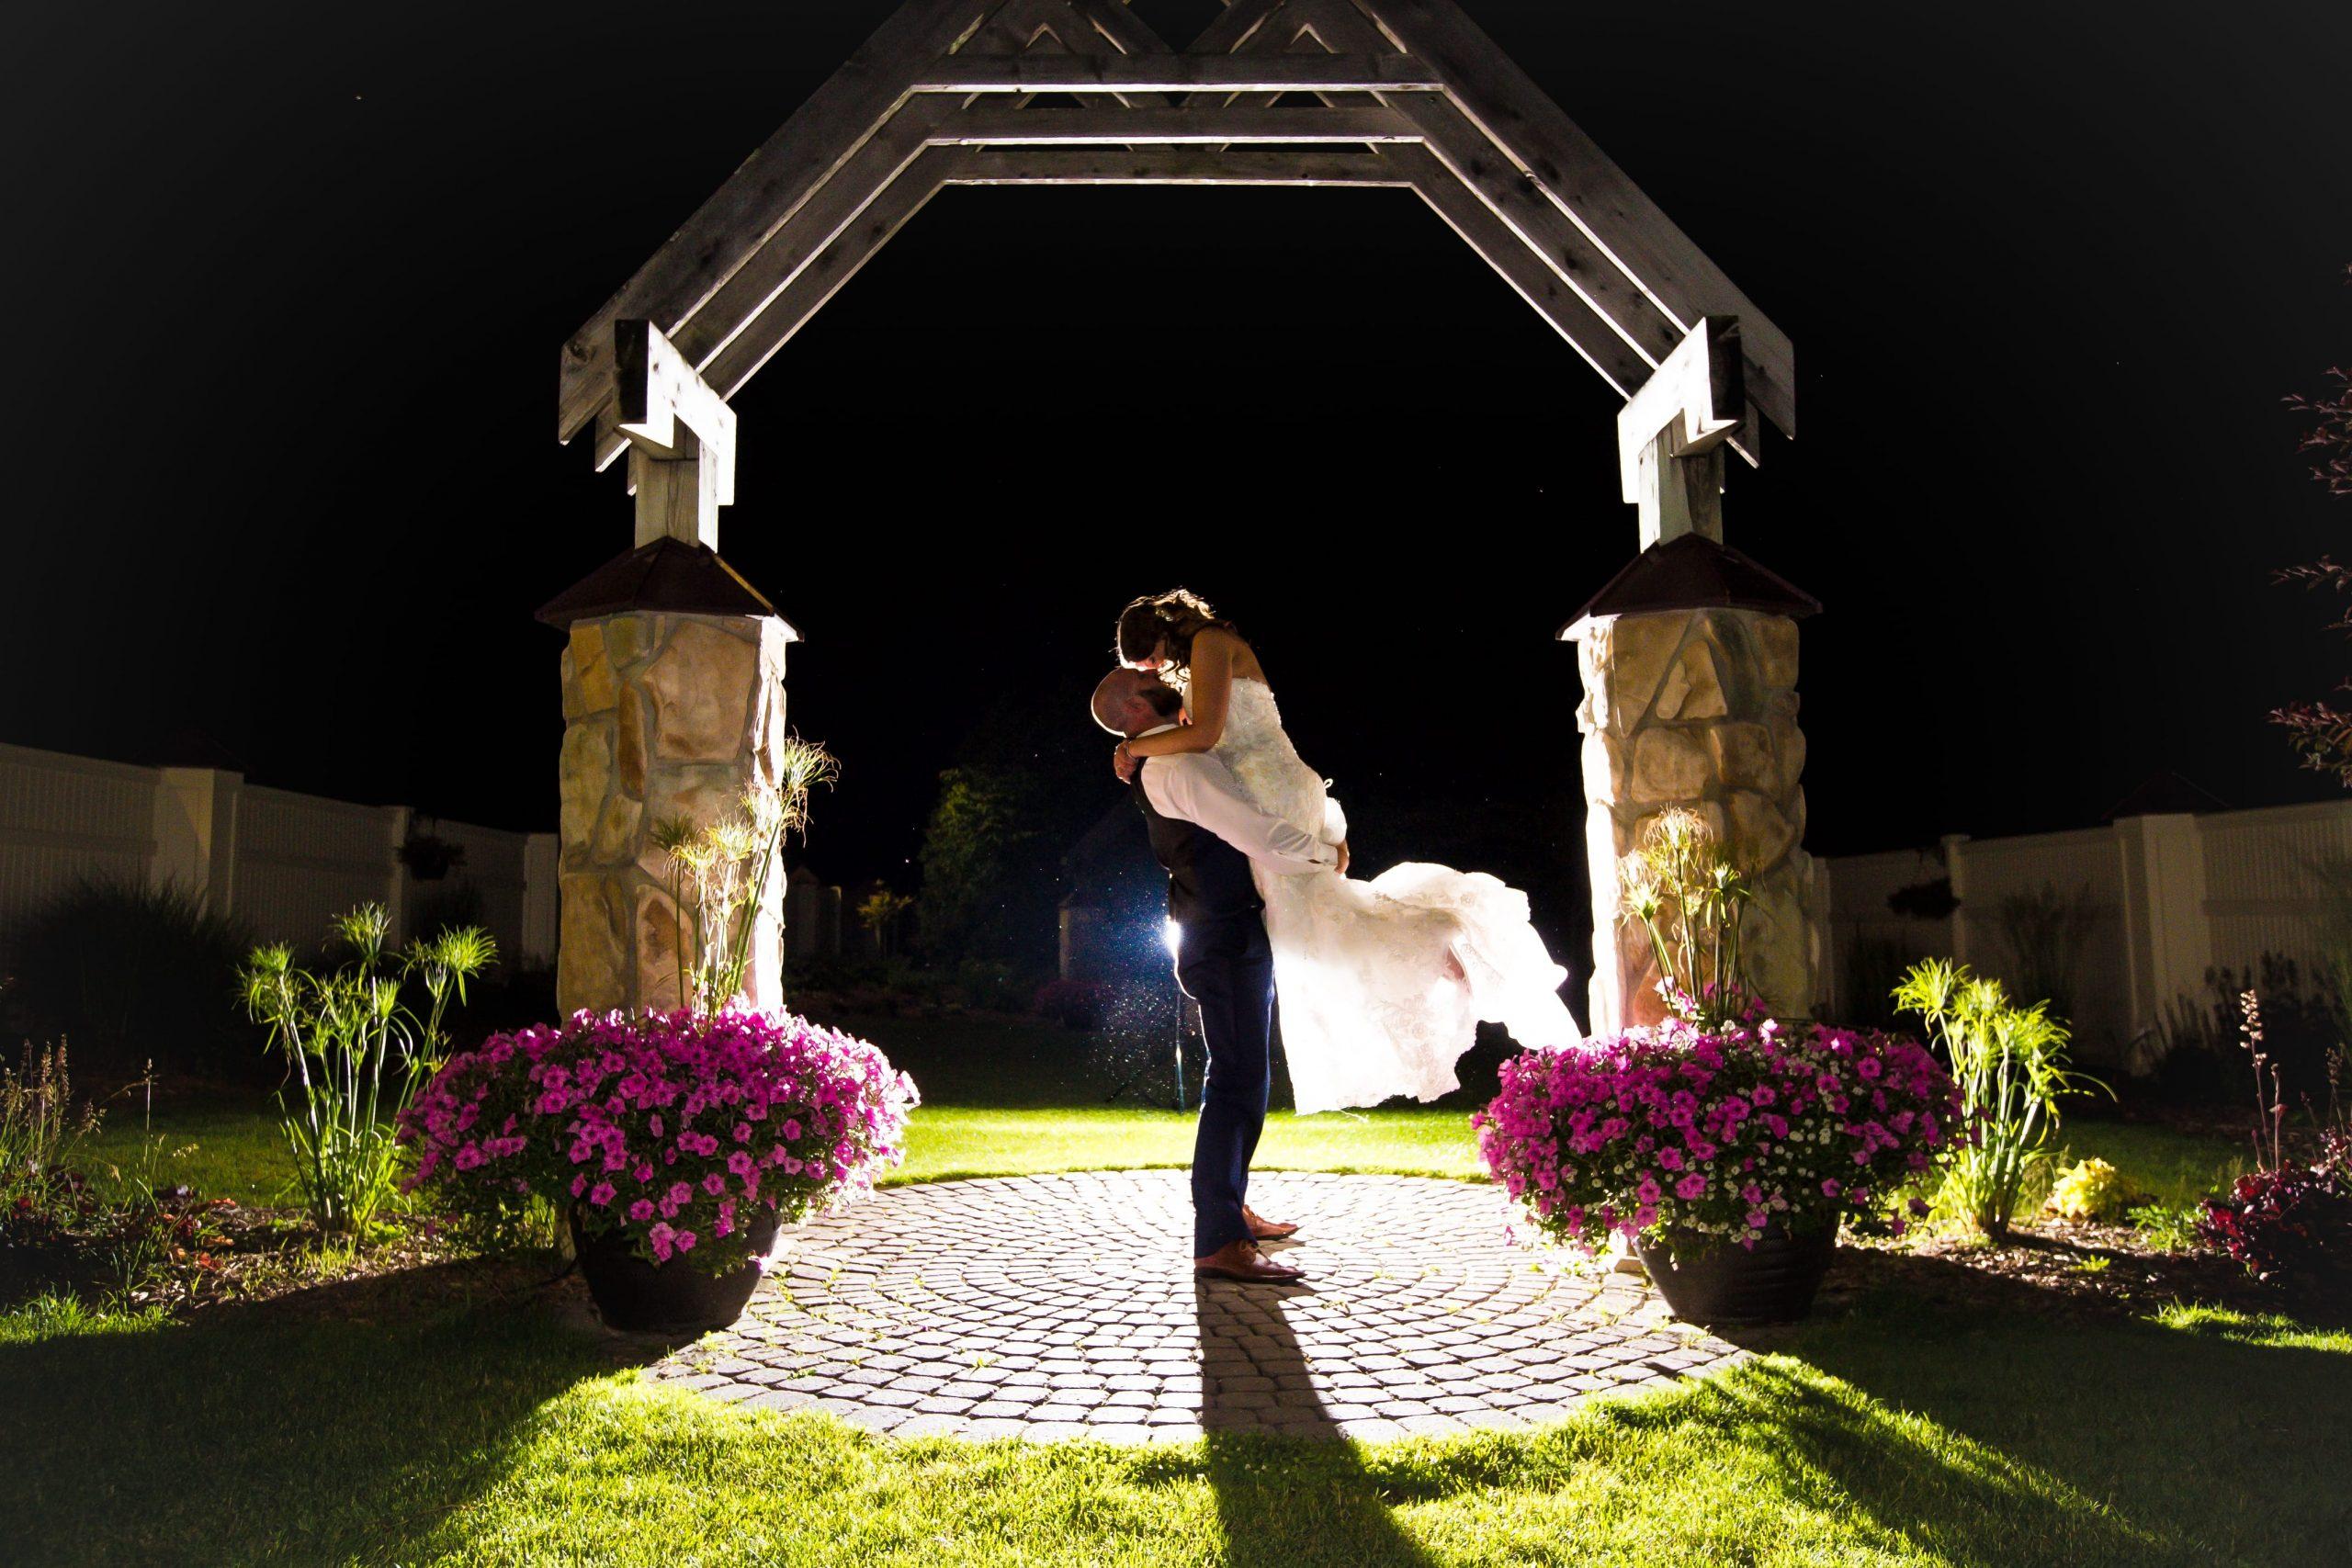 groom lifting bride for evening romantics